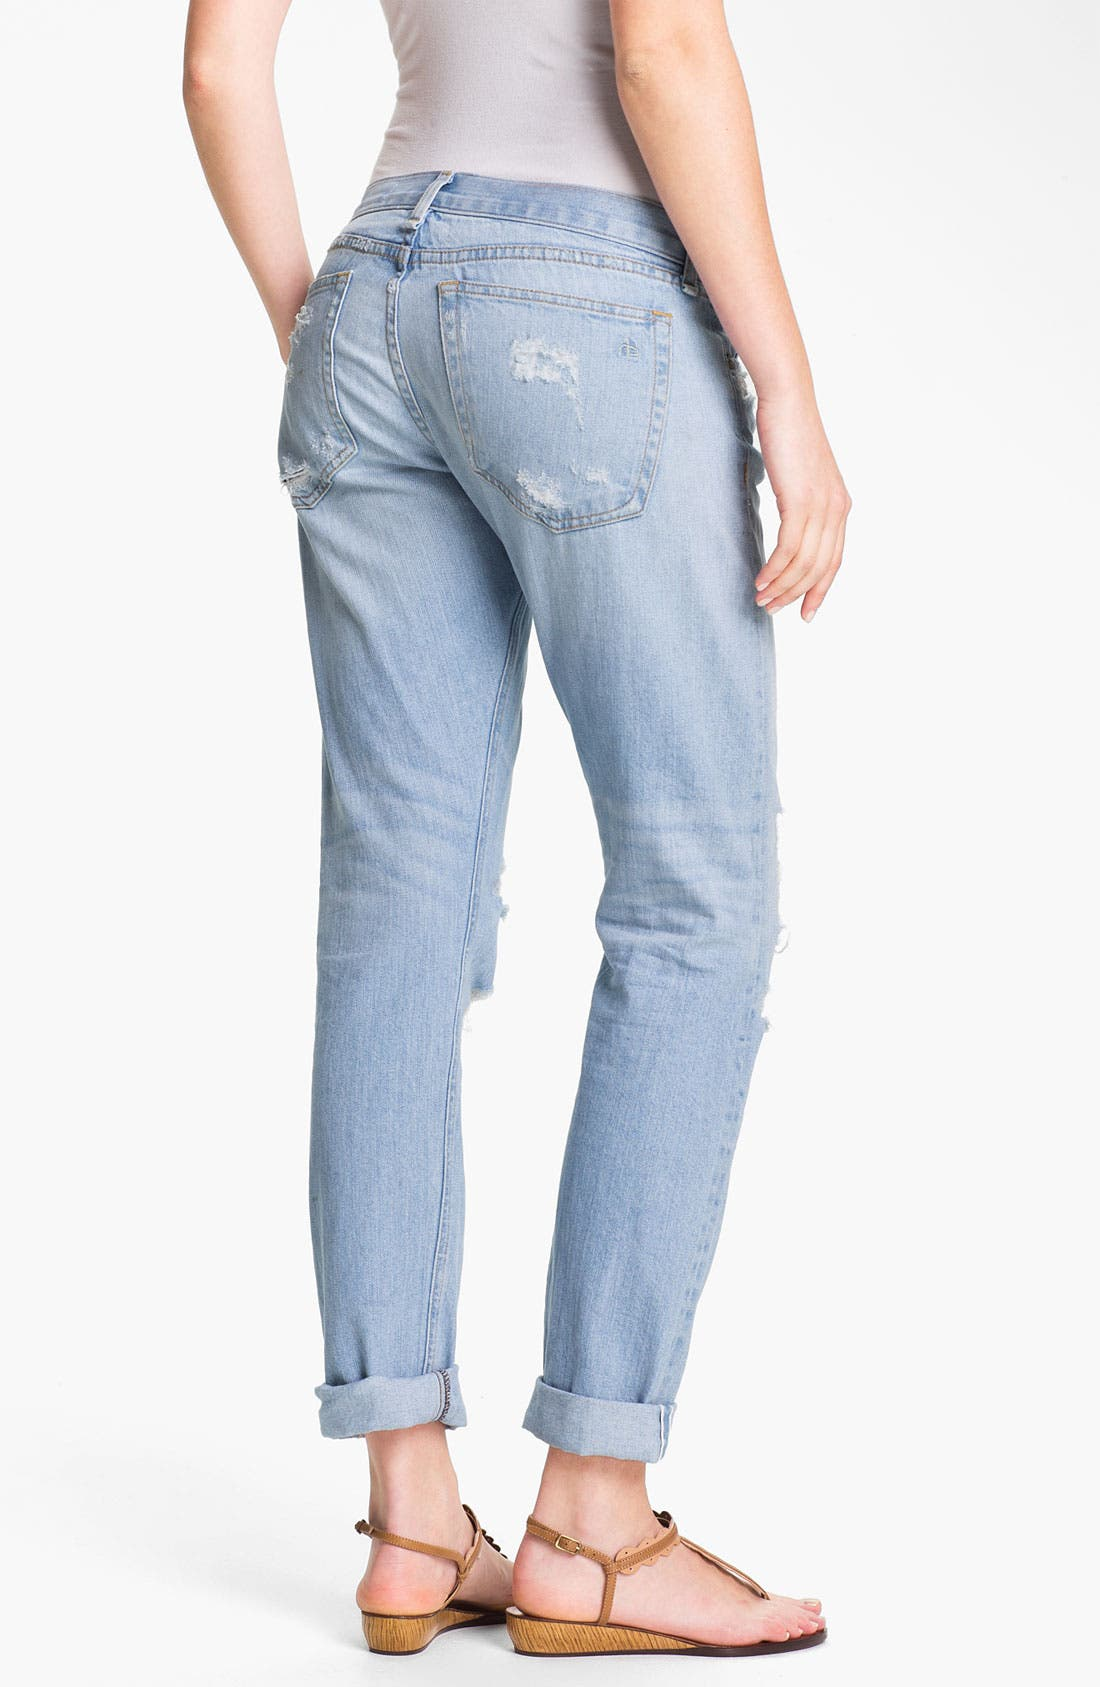 Alternate Image 3  - rag & bone/JEAN 'The Boyfriend' Selvedge Denim Jeans